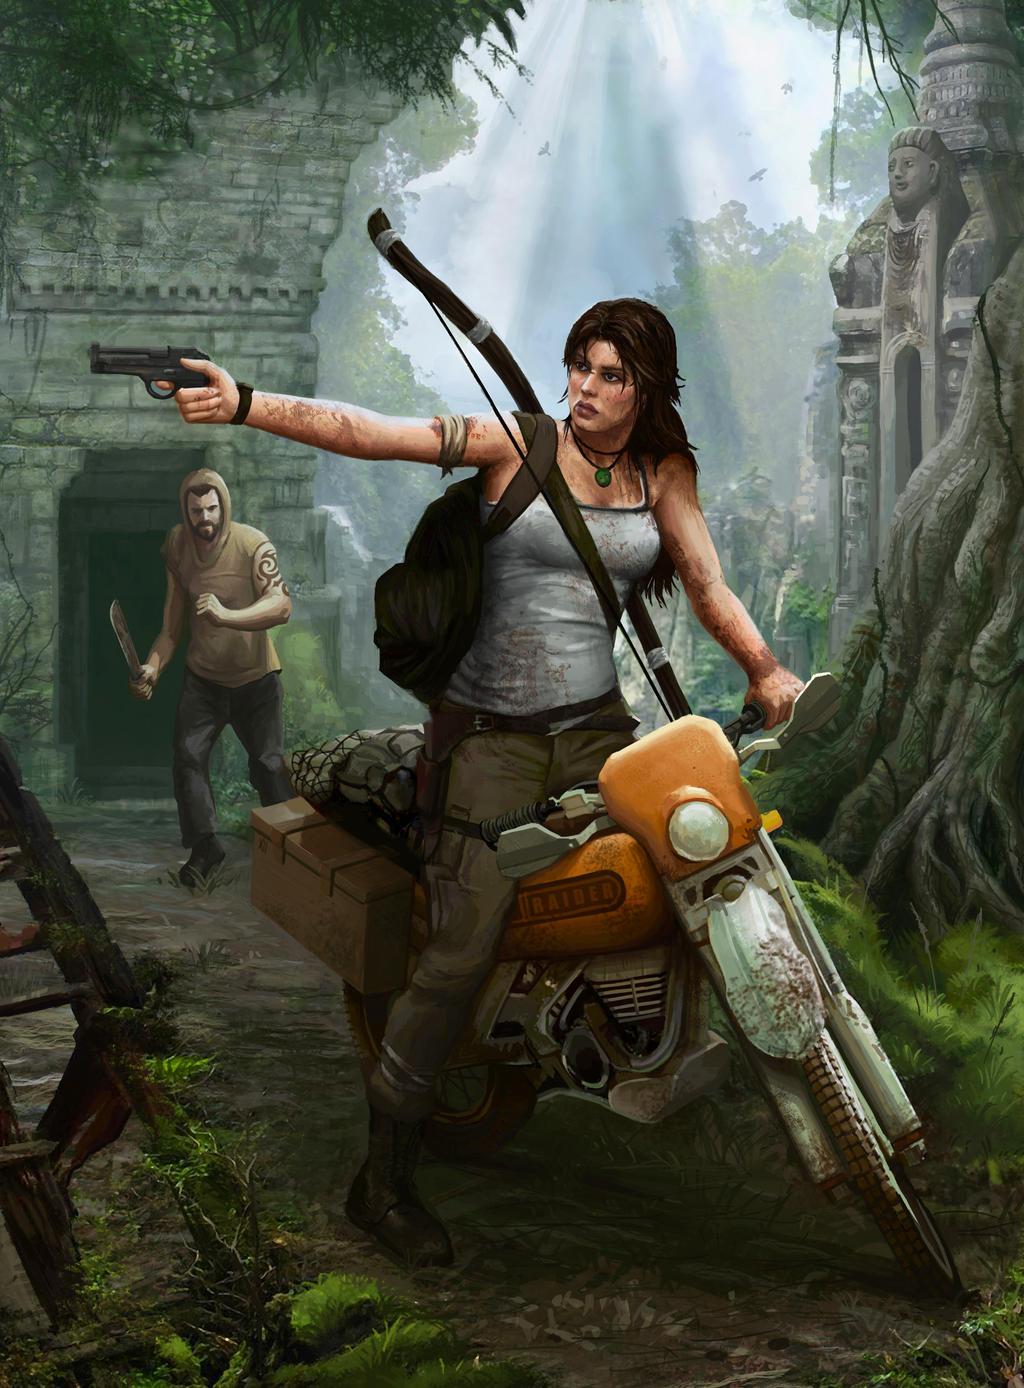 Lara Croft Tomb Raider 2013 by squiffel